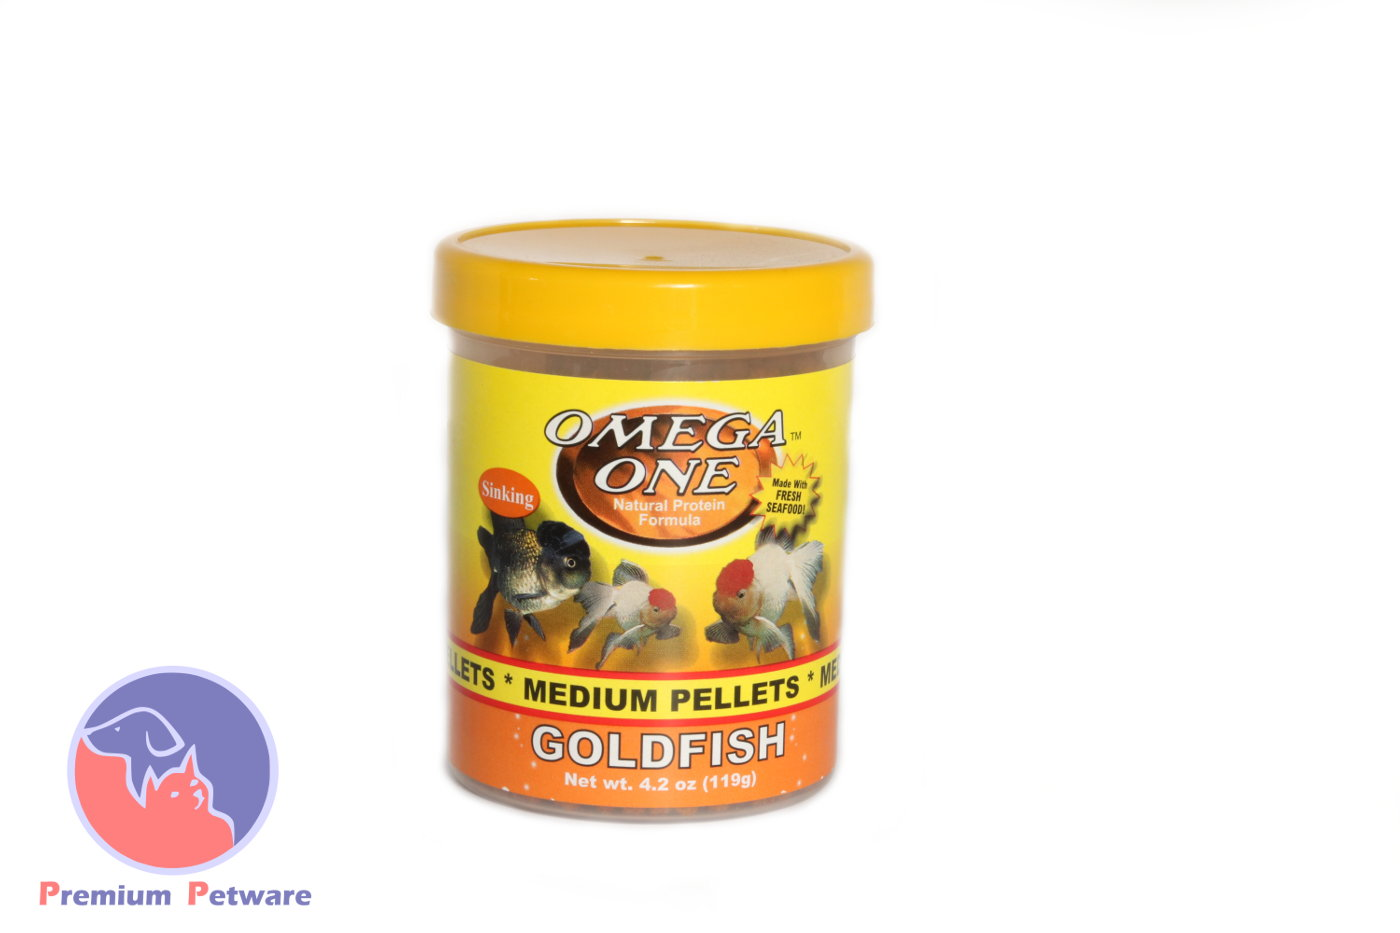 Omega one goldfish pellets premium petware for Omega one fish food